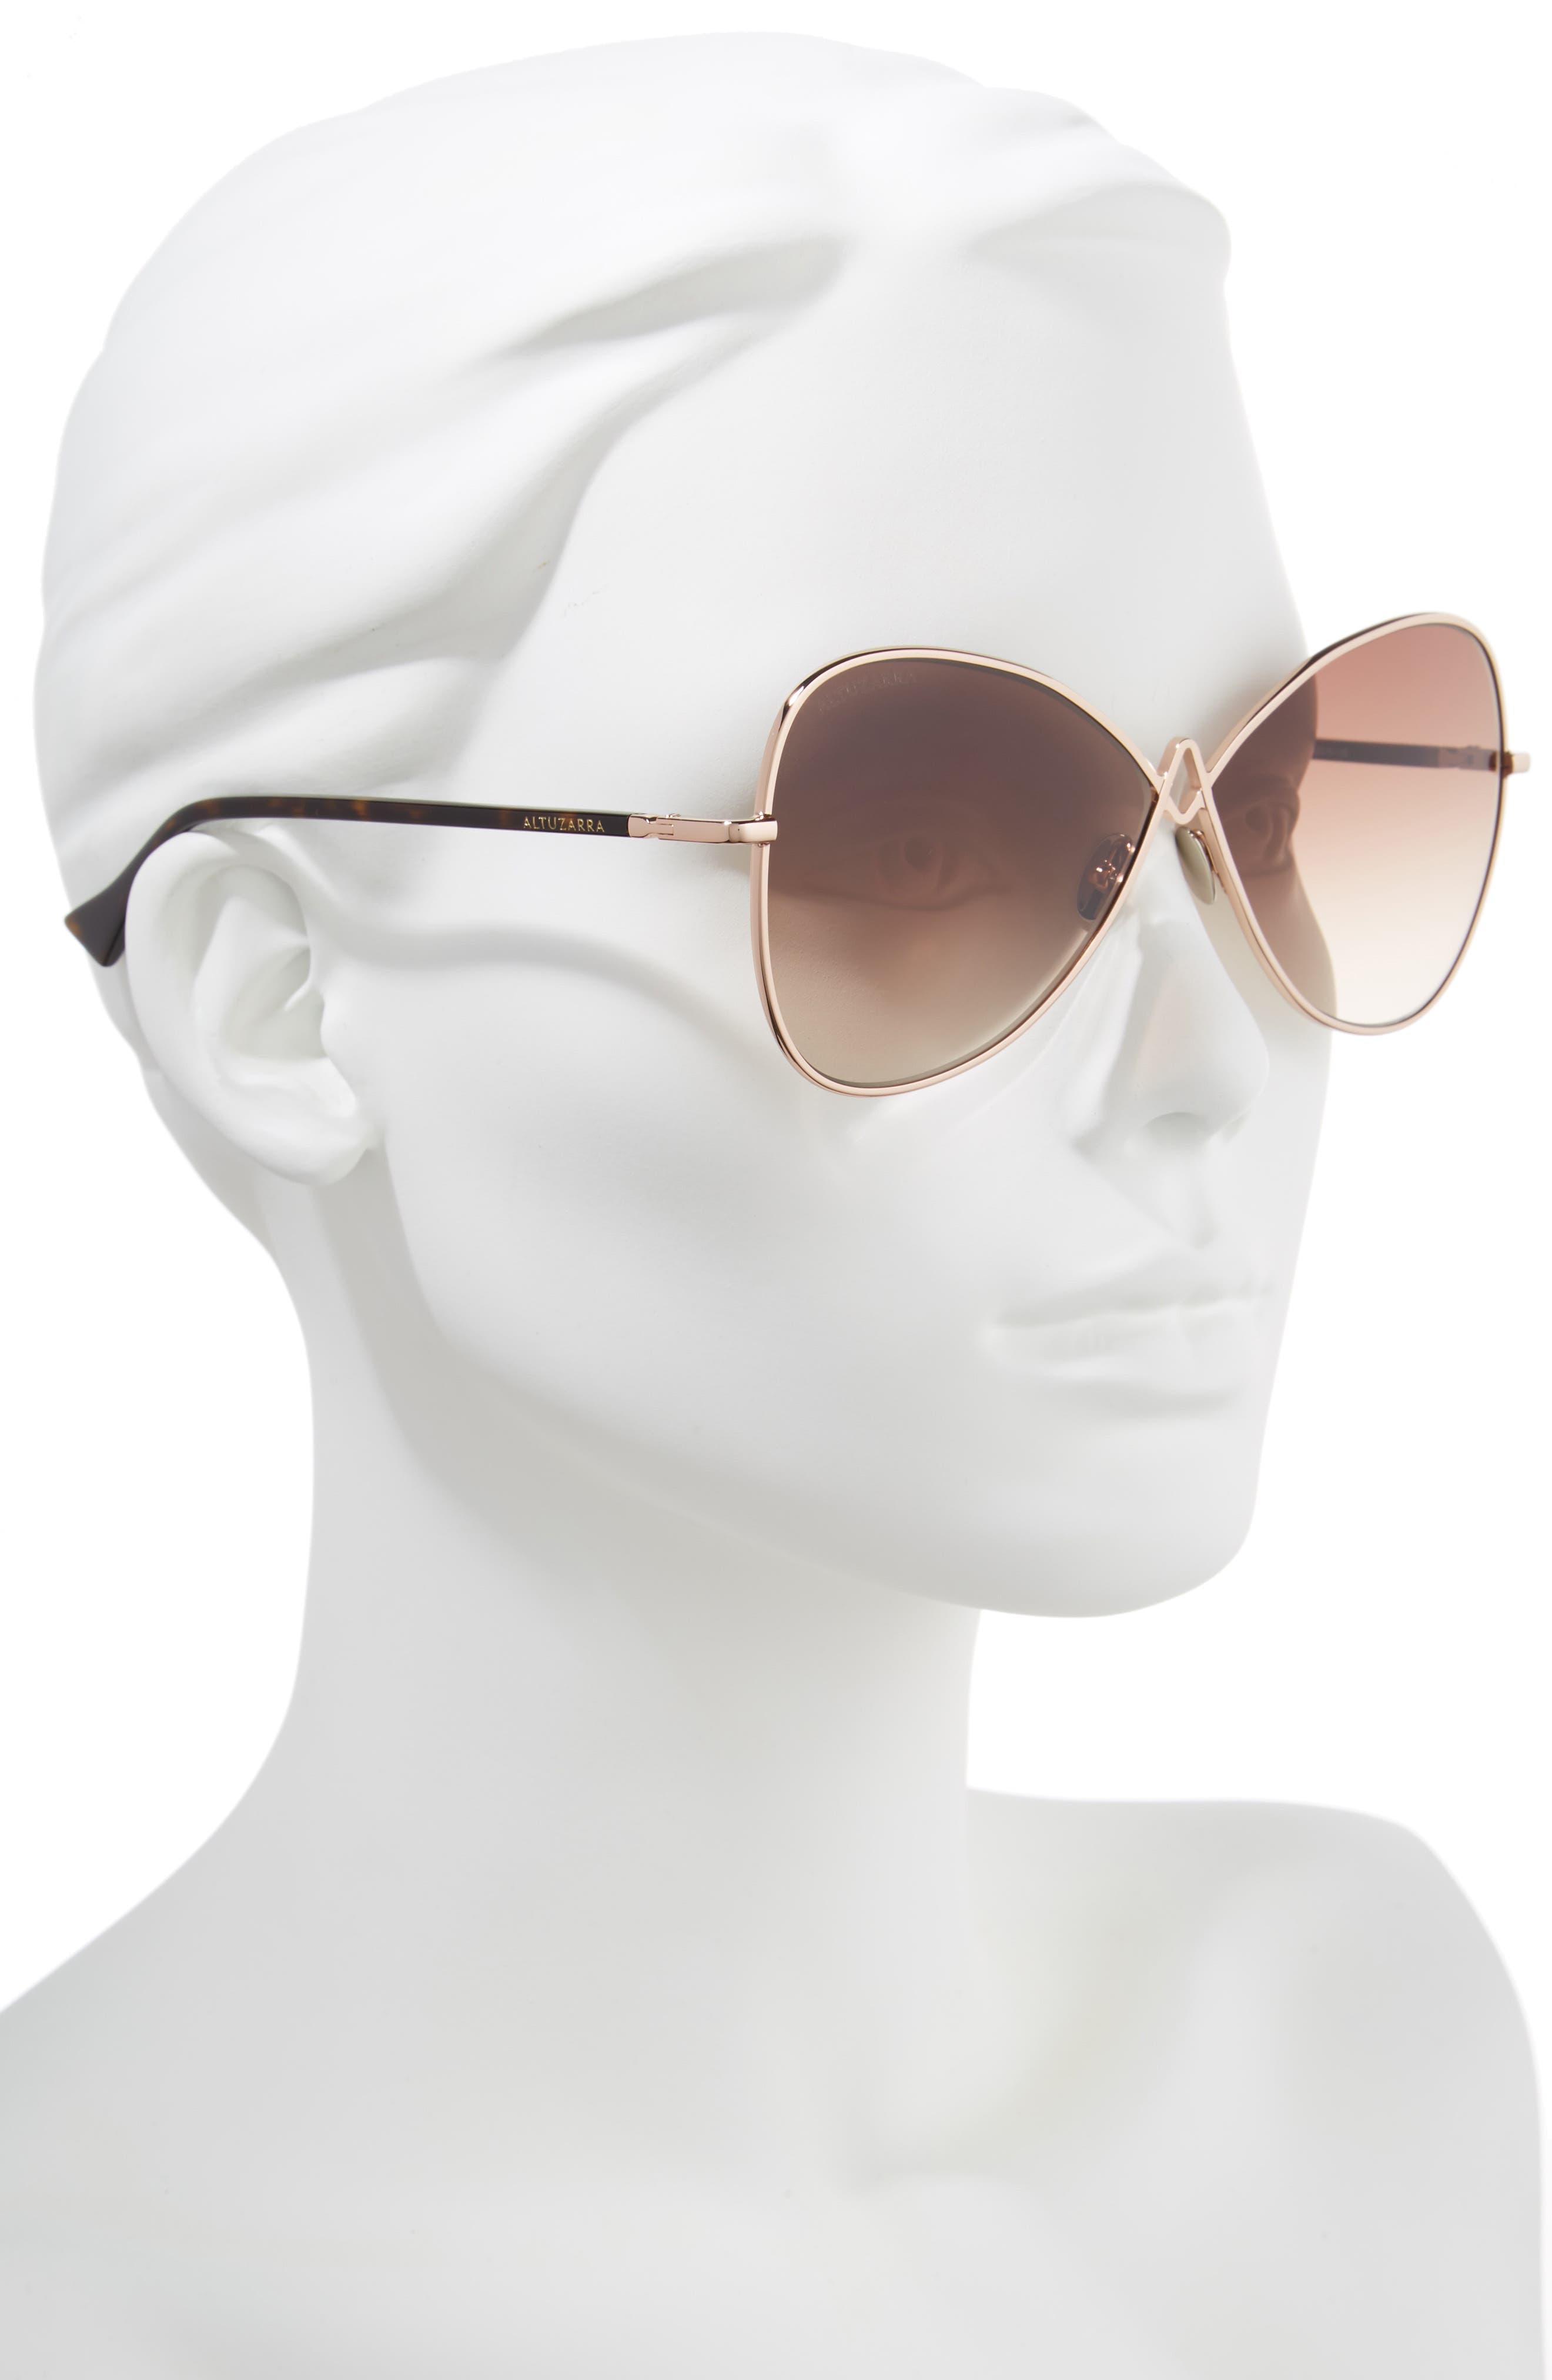 62mm Sunglasses,                             Alternate thumbnail 2, color,                             Rose Gold